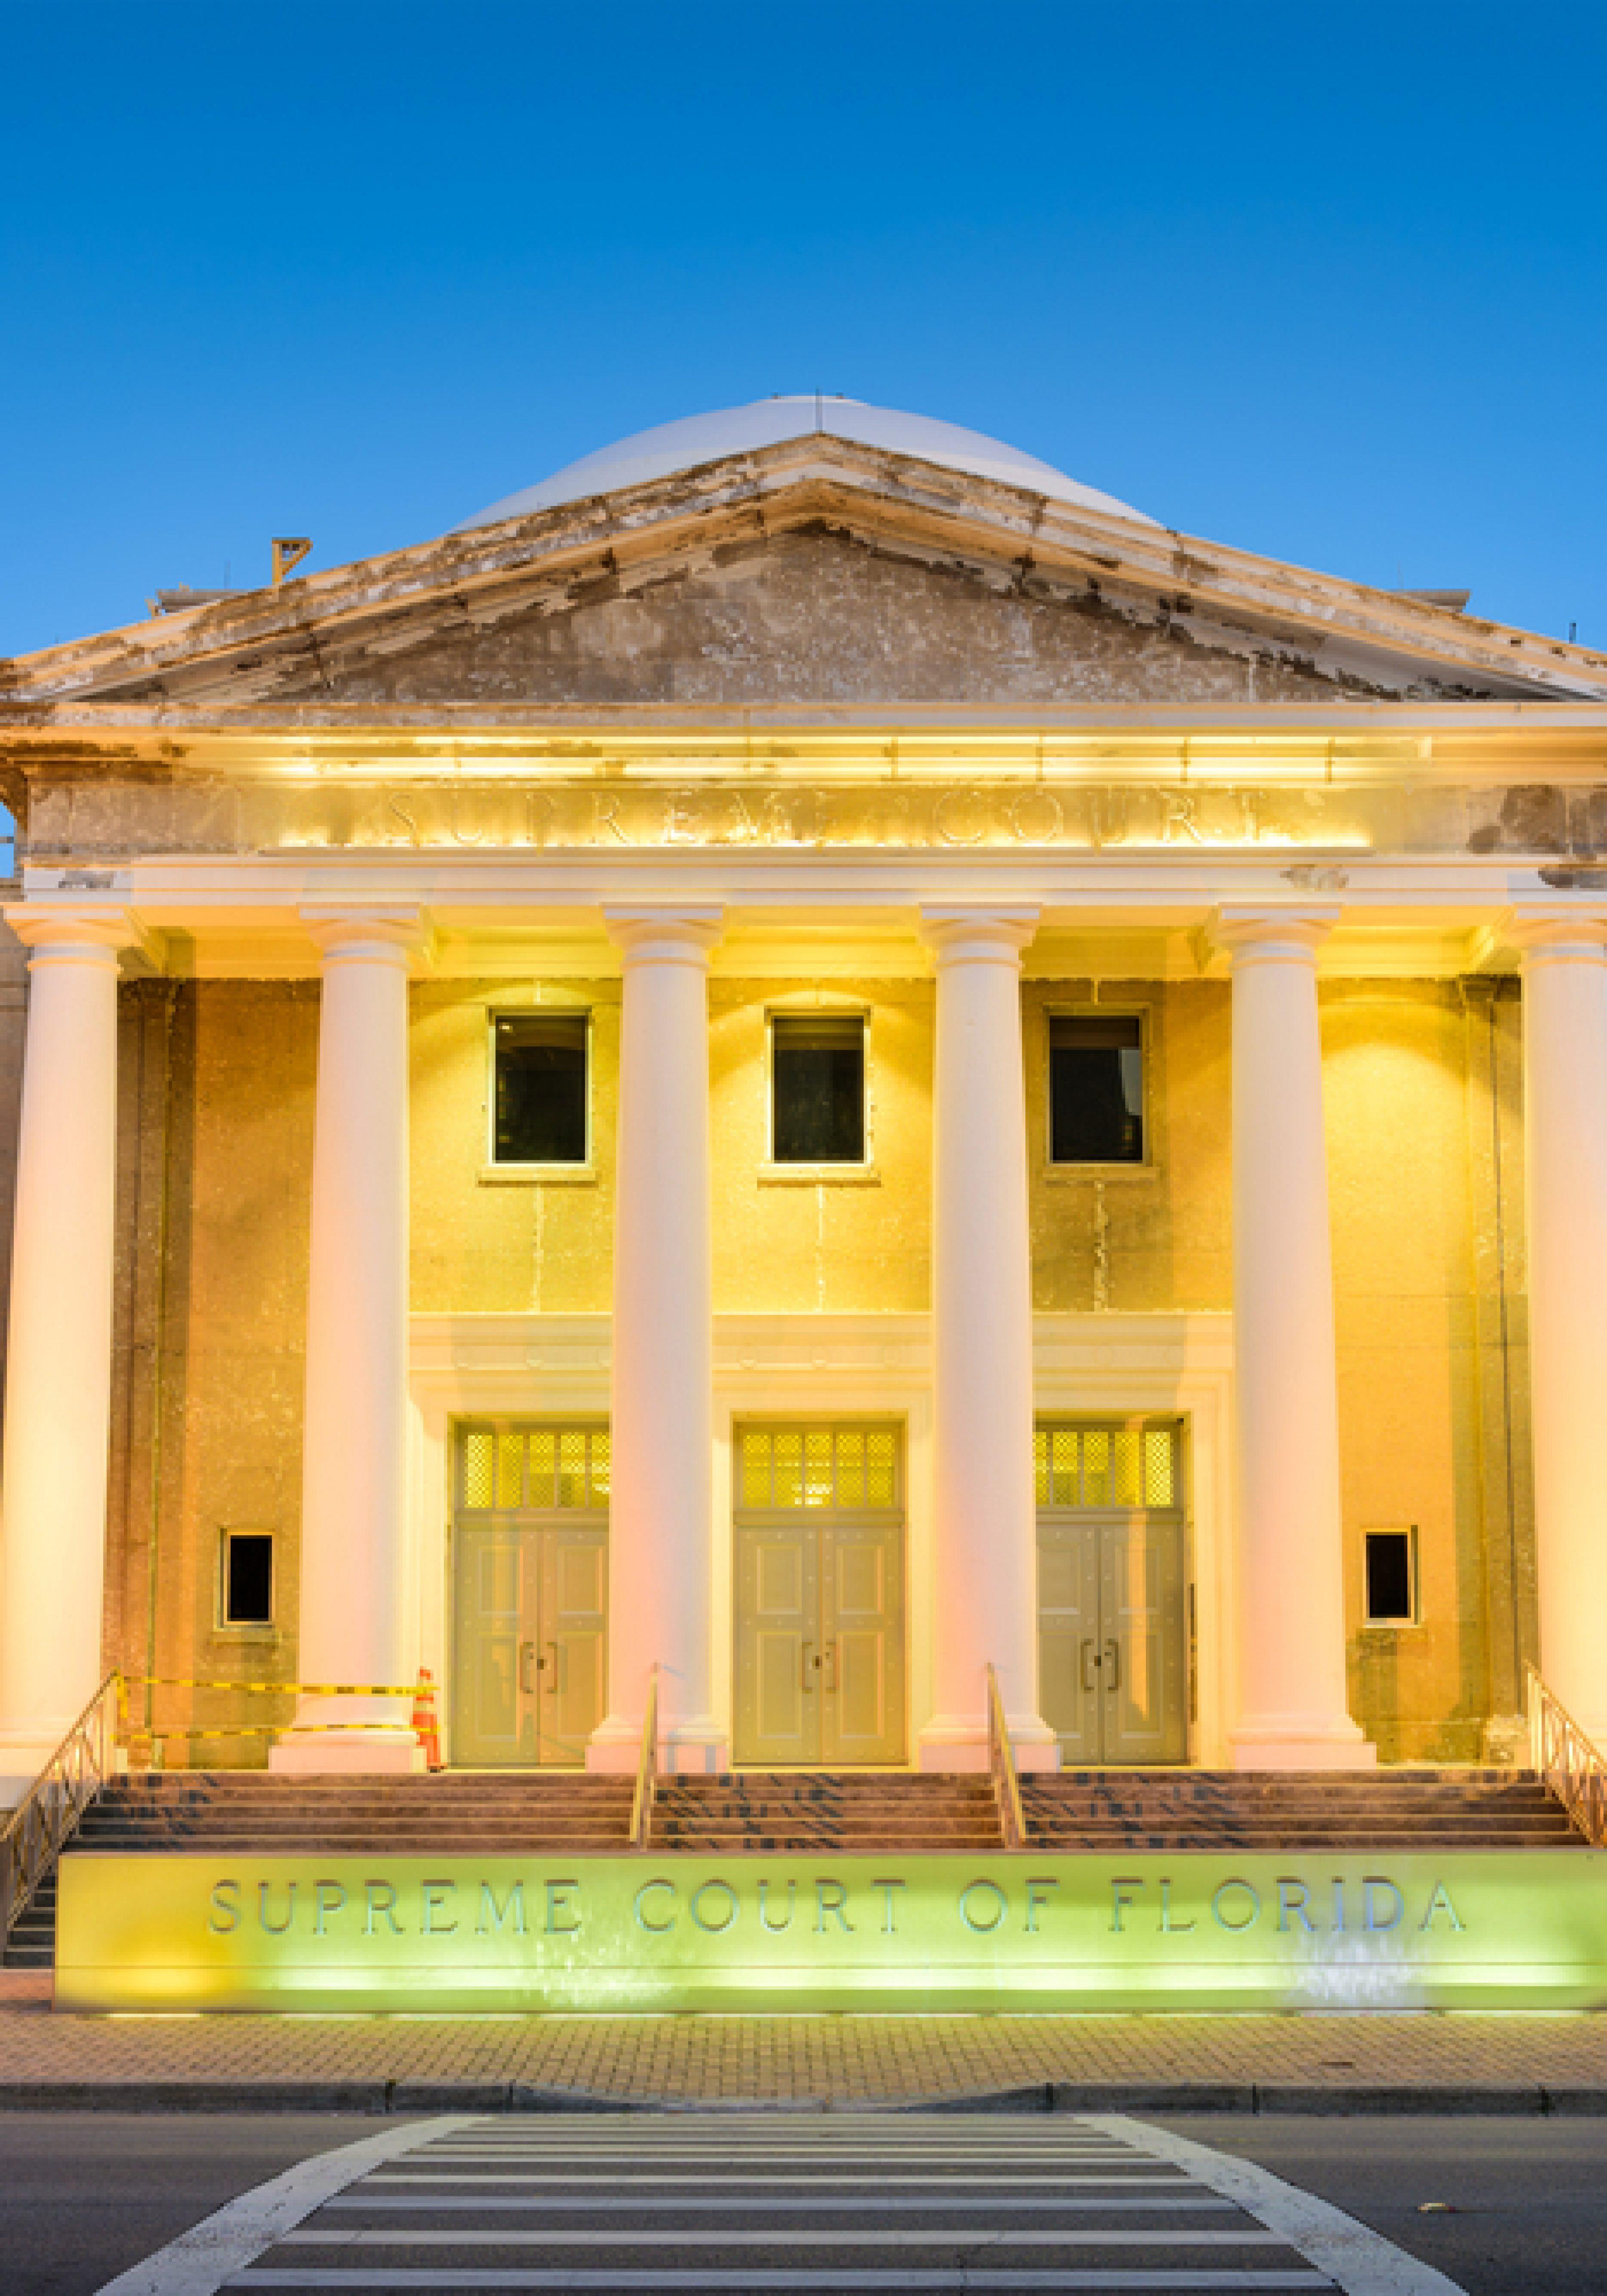 florida-supreme-court-lit-up-3500x5000.jpg